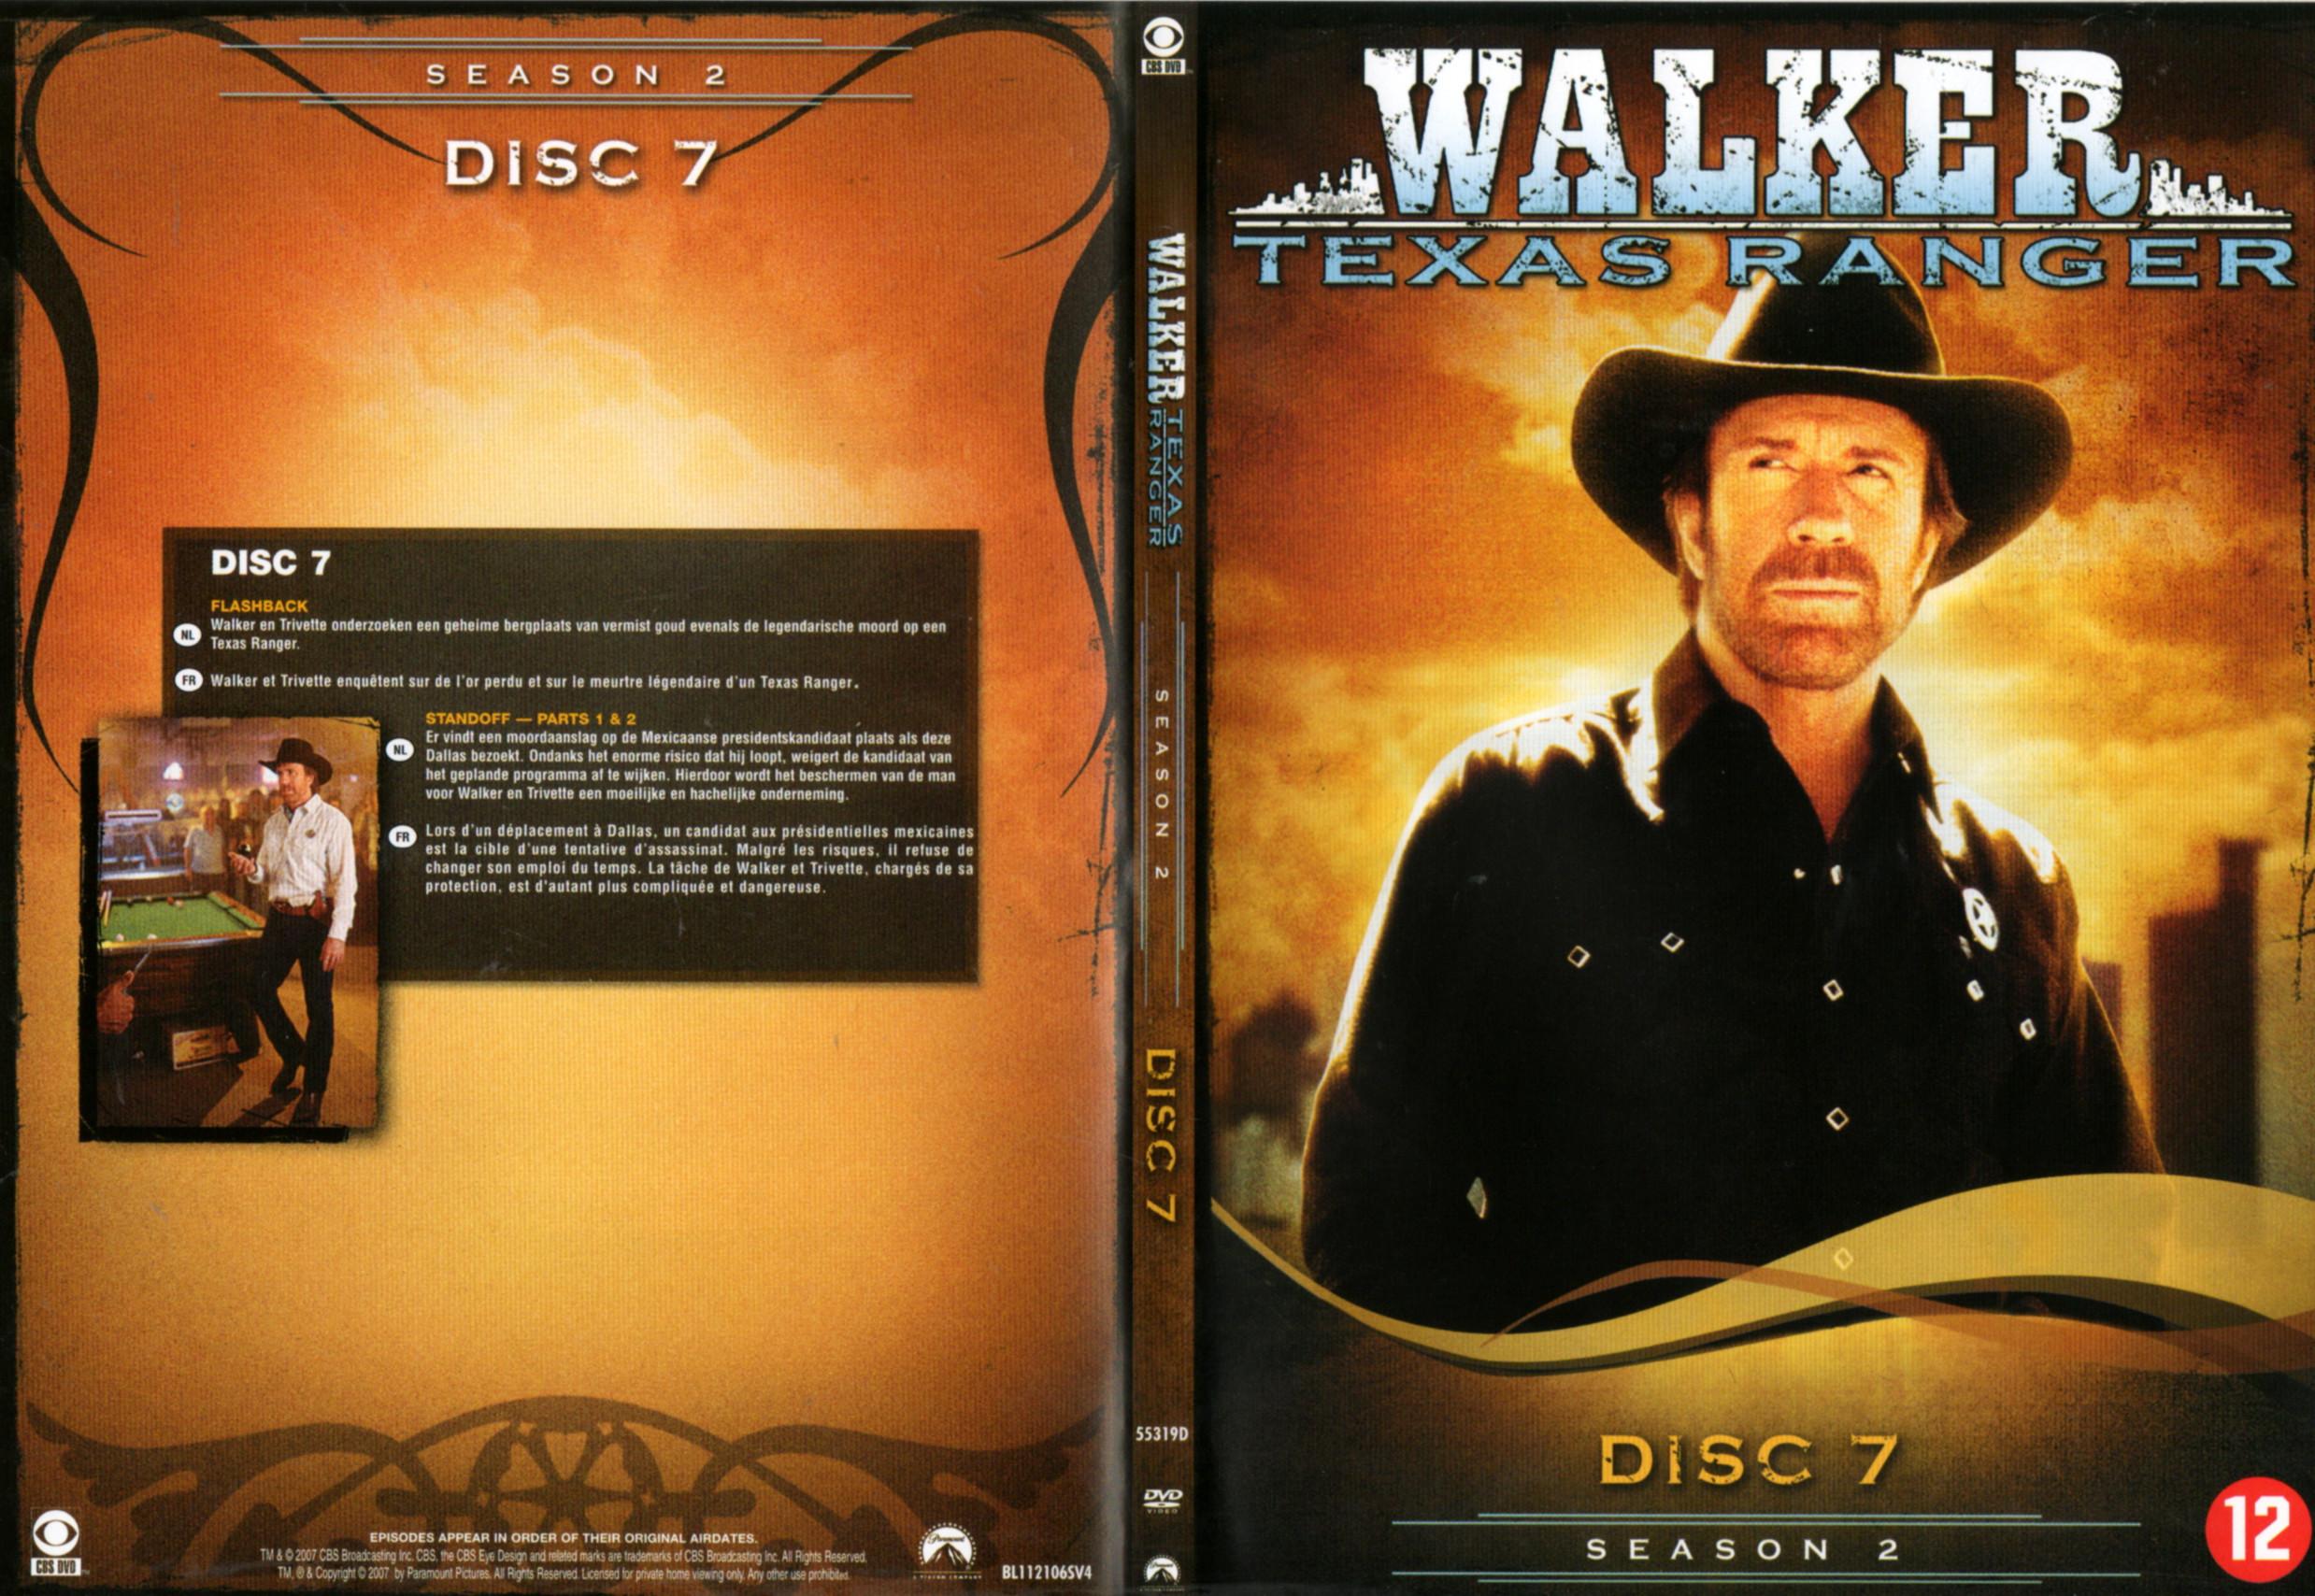 Walker, Texas Ranger Images | Crazy Gallery